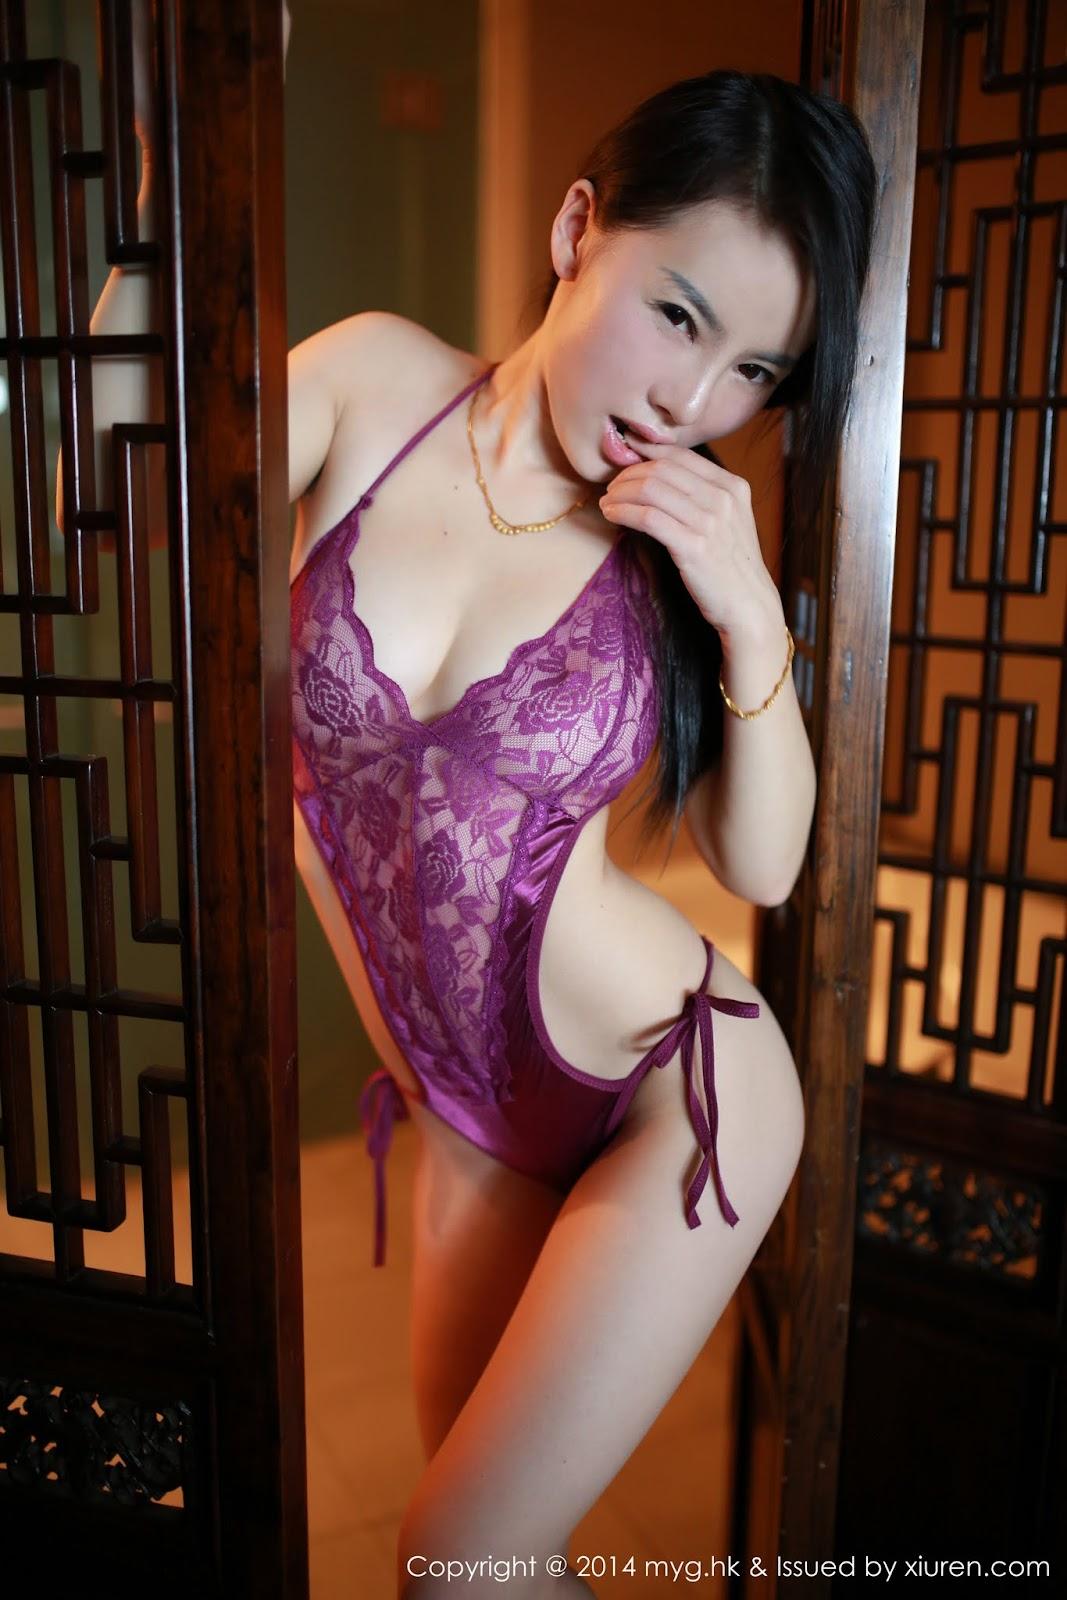 20023 003 - MYGIRL VOL.30 Photo Nude Hot Sexy